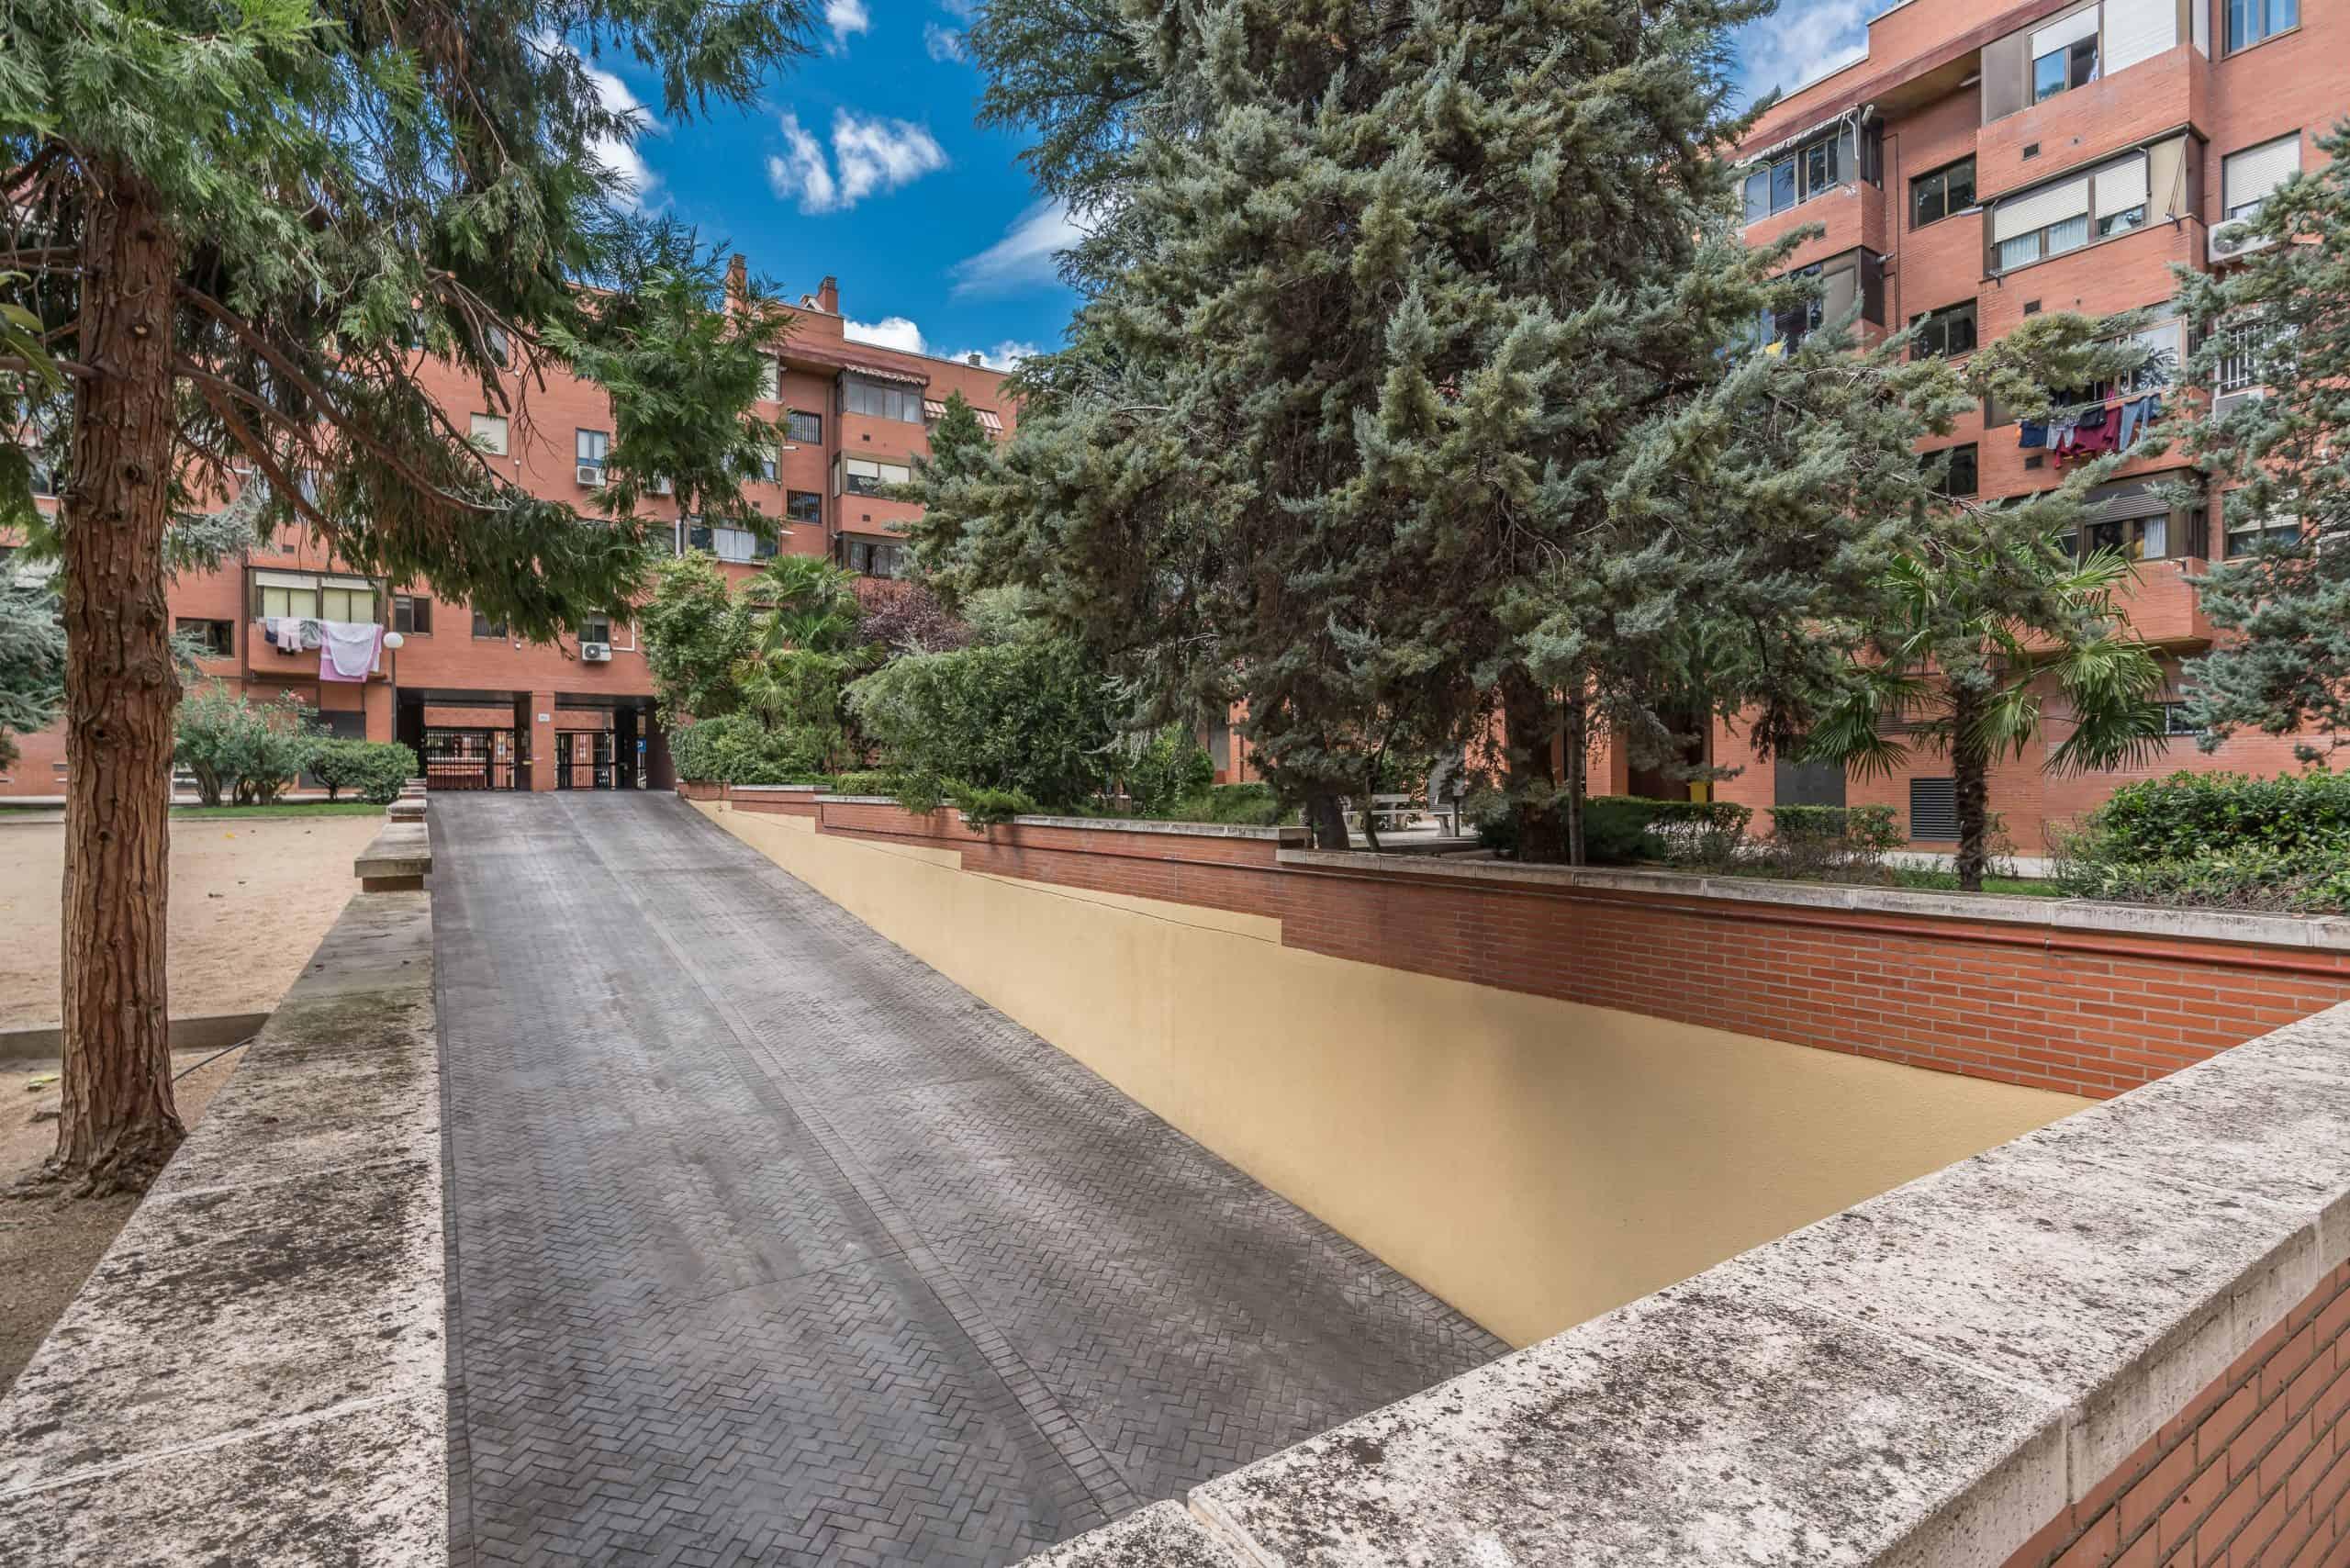 Agencia Inmobiliaria de Madrid-FUTUROCASA- ZONAS COMUNES (7)